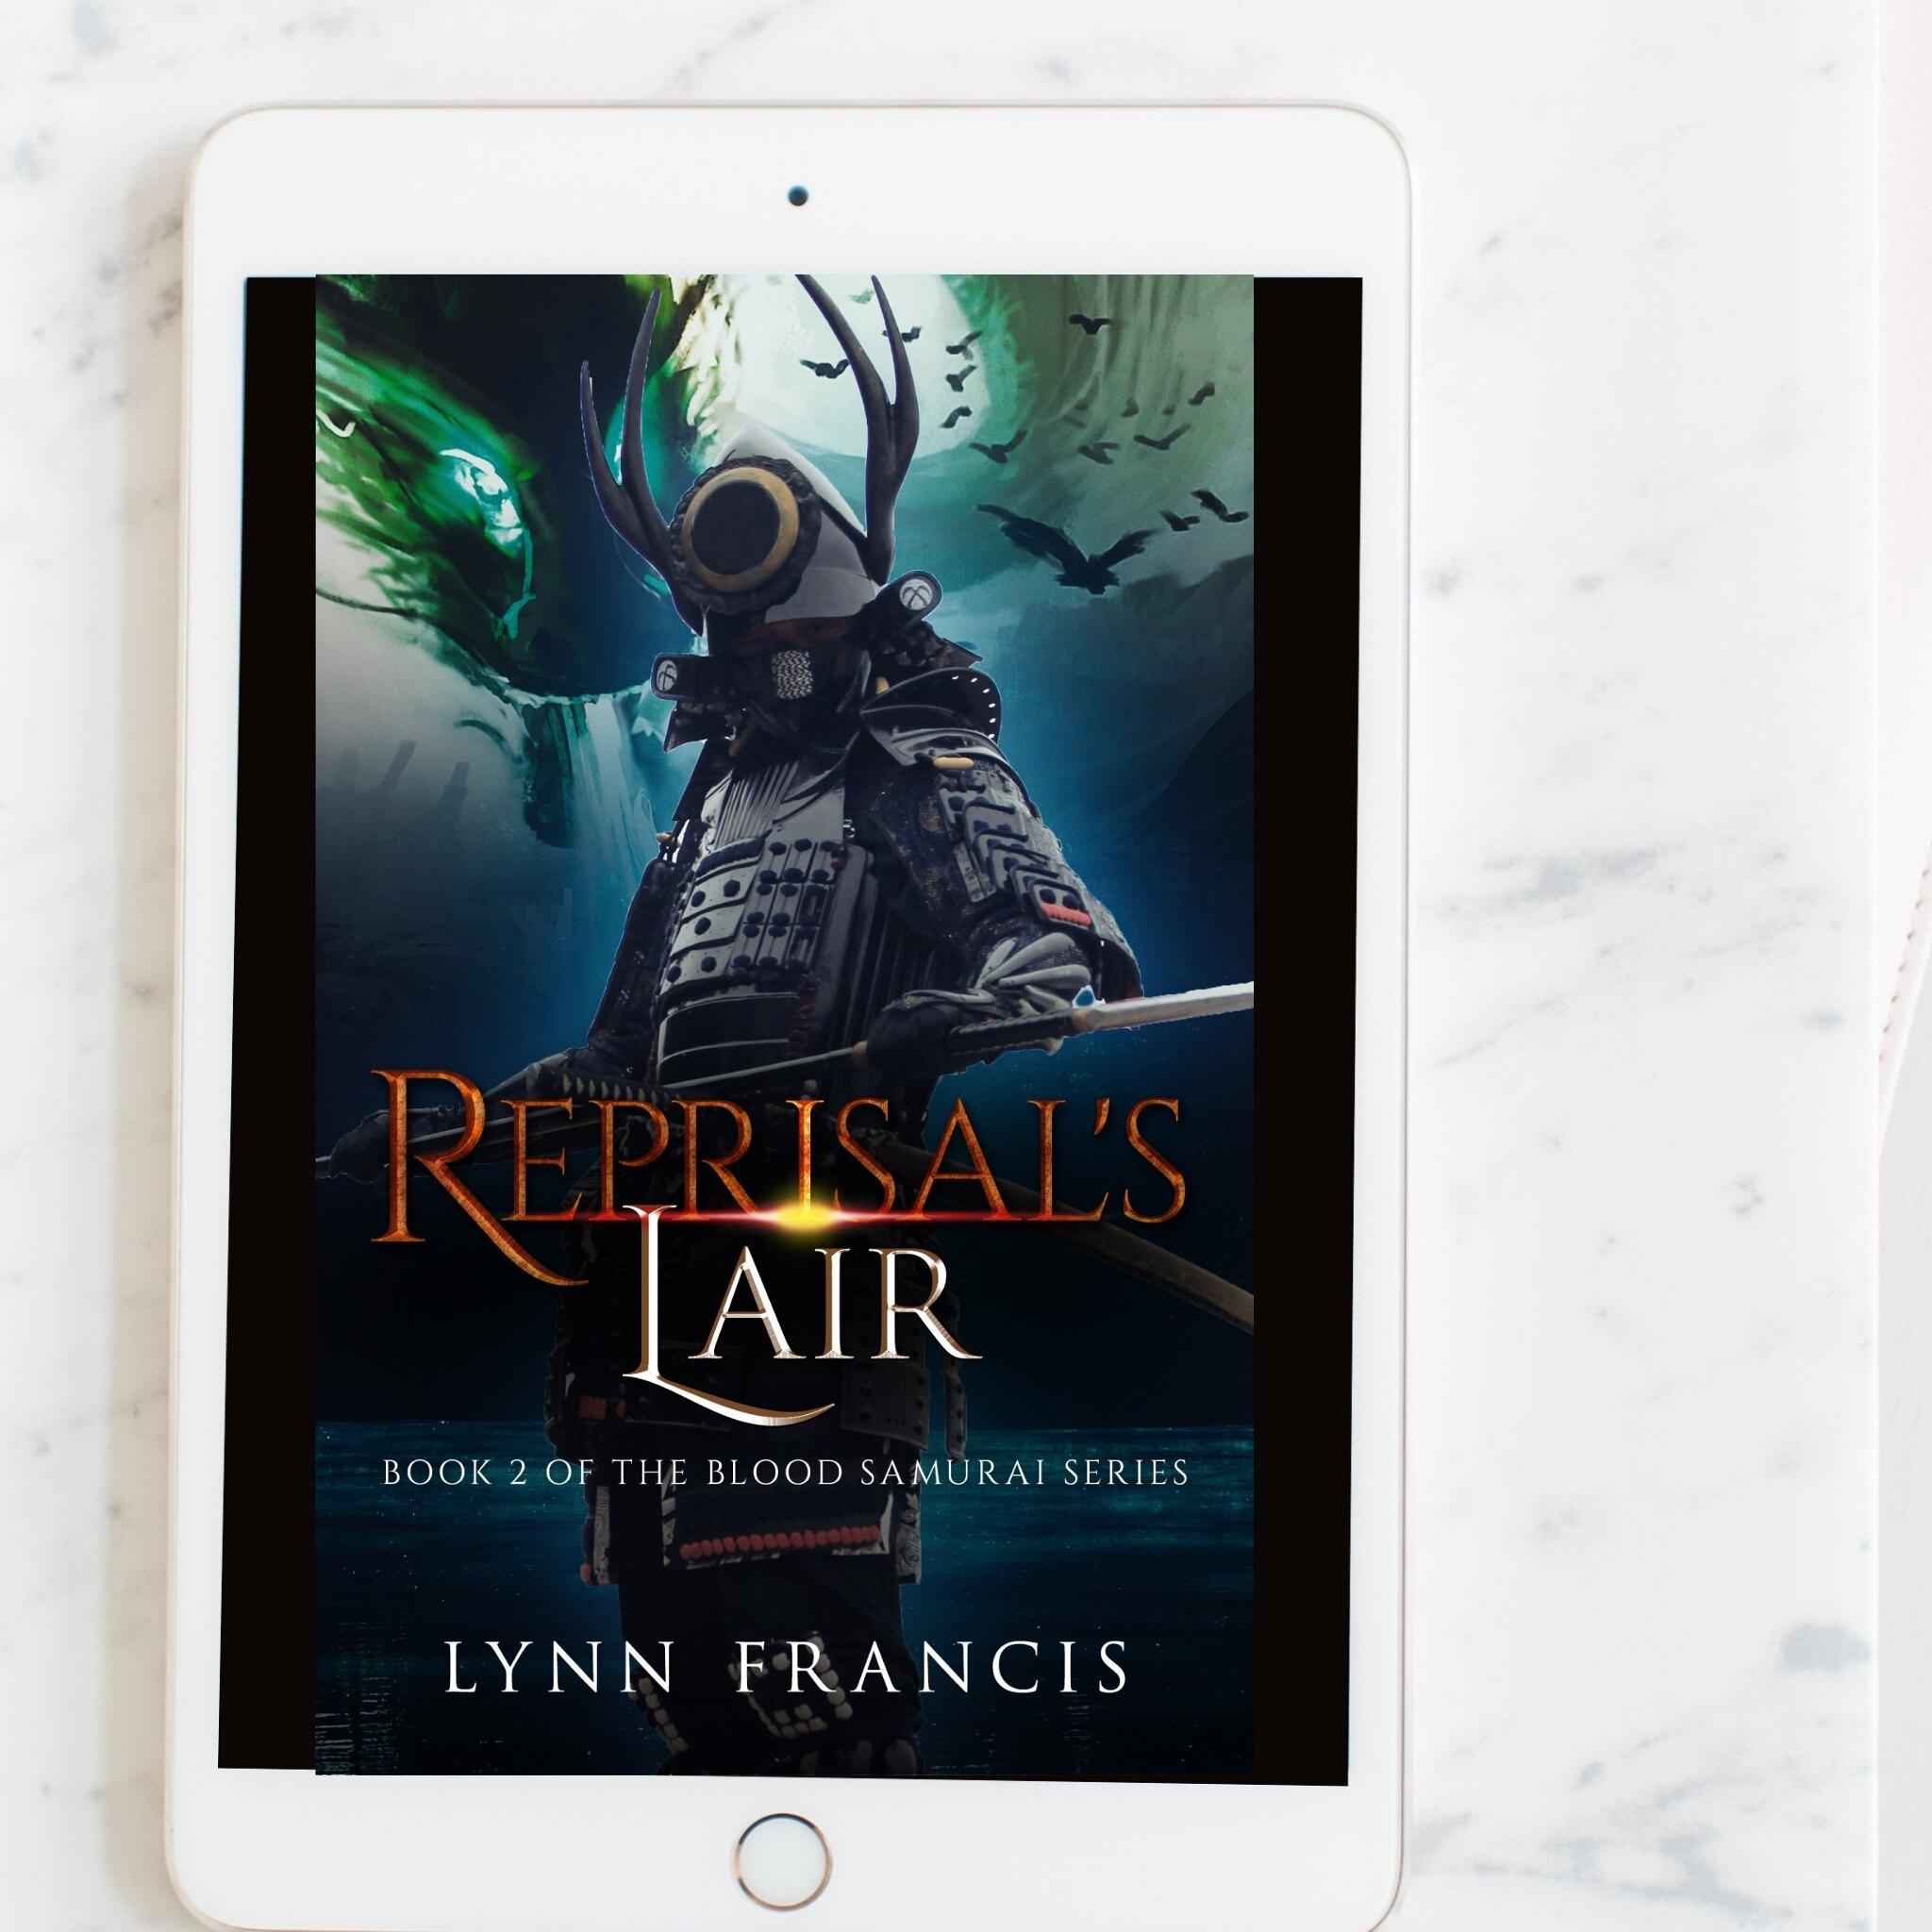 Reprisal's lair book 2 of the blood samurai fantasy